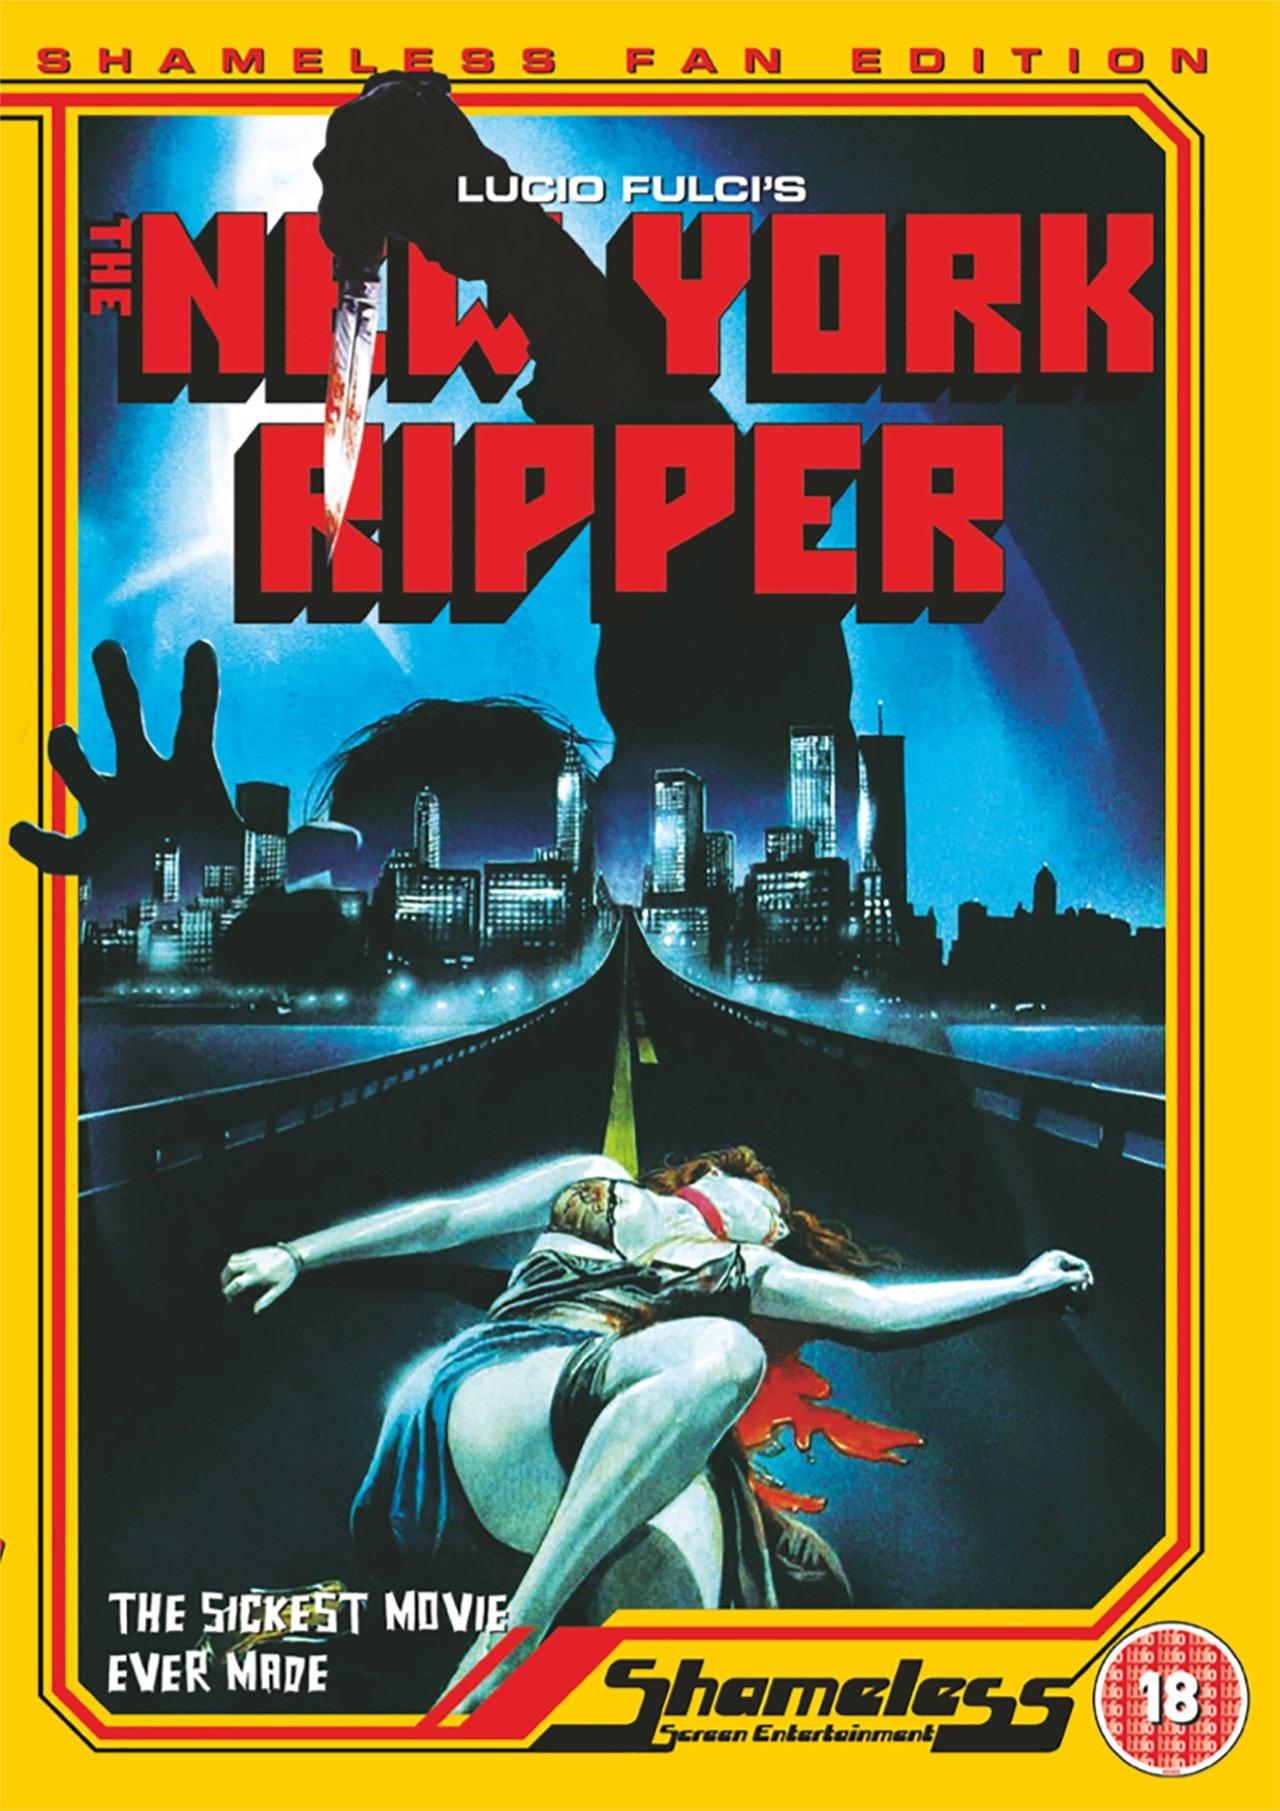 The New York Ripper - 1